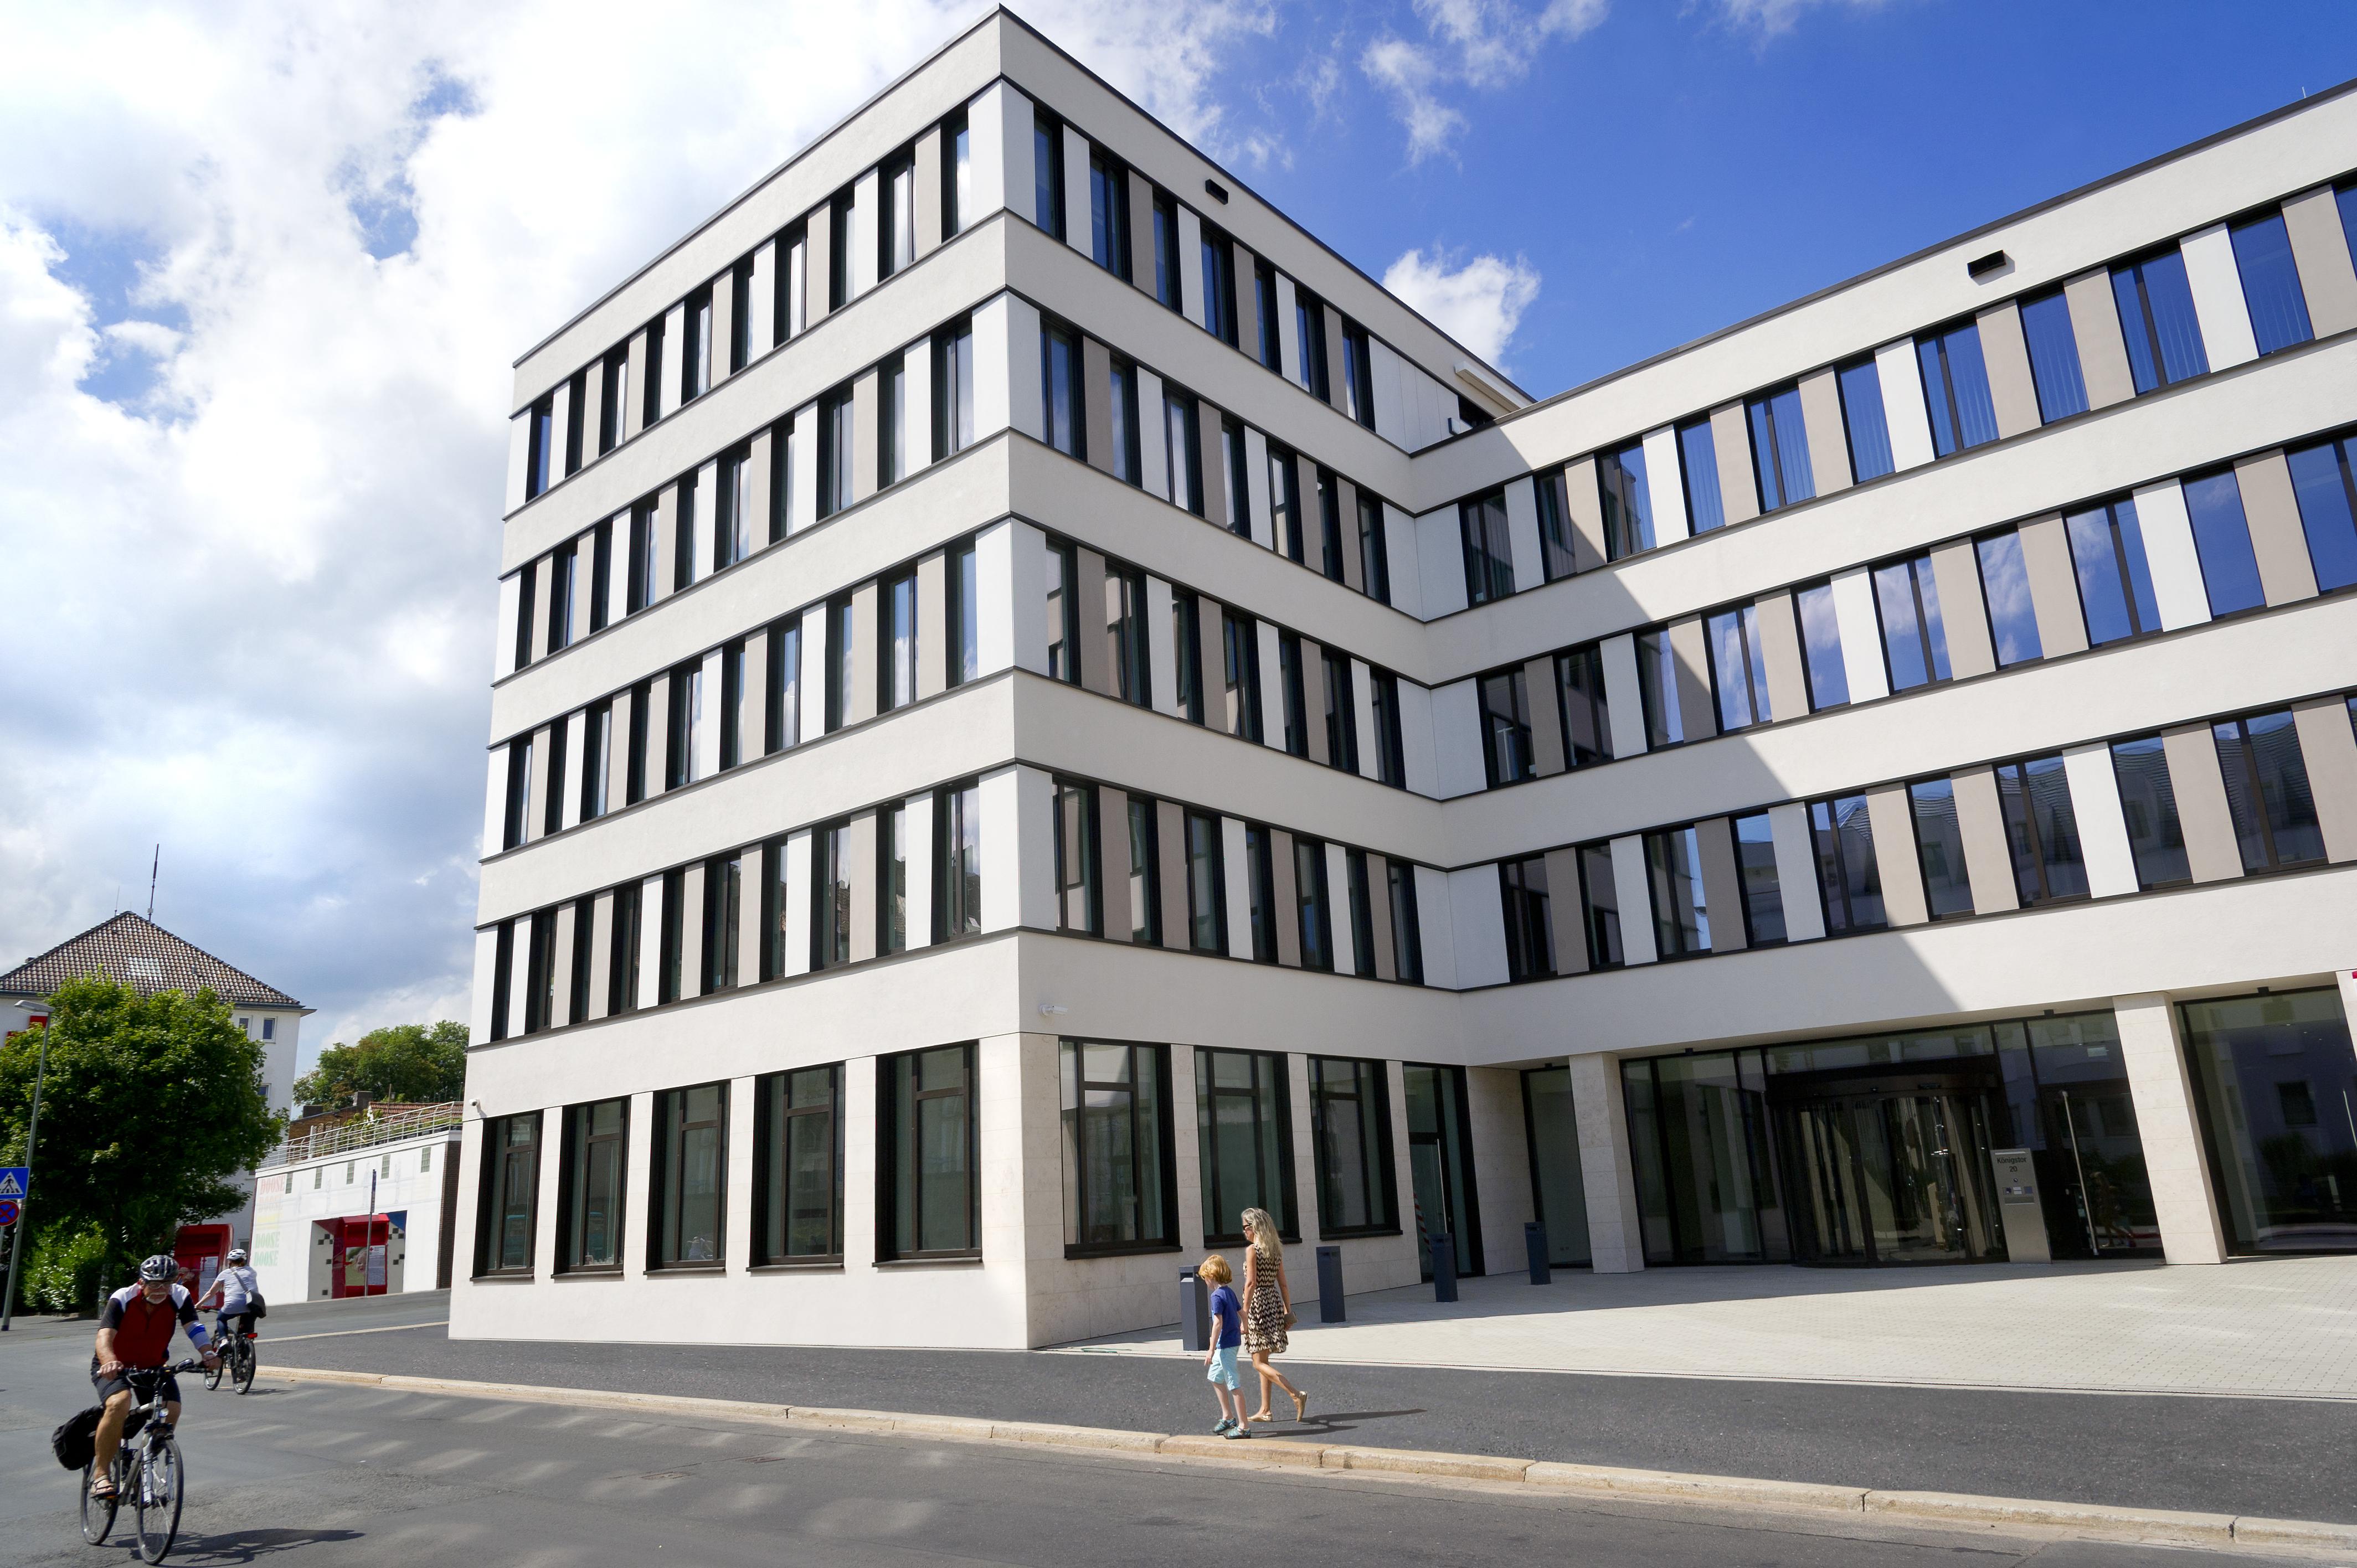 Erfreut Zentrale Kesselinstallation Bilder - Verdrahtungsideen ...